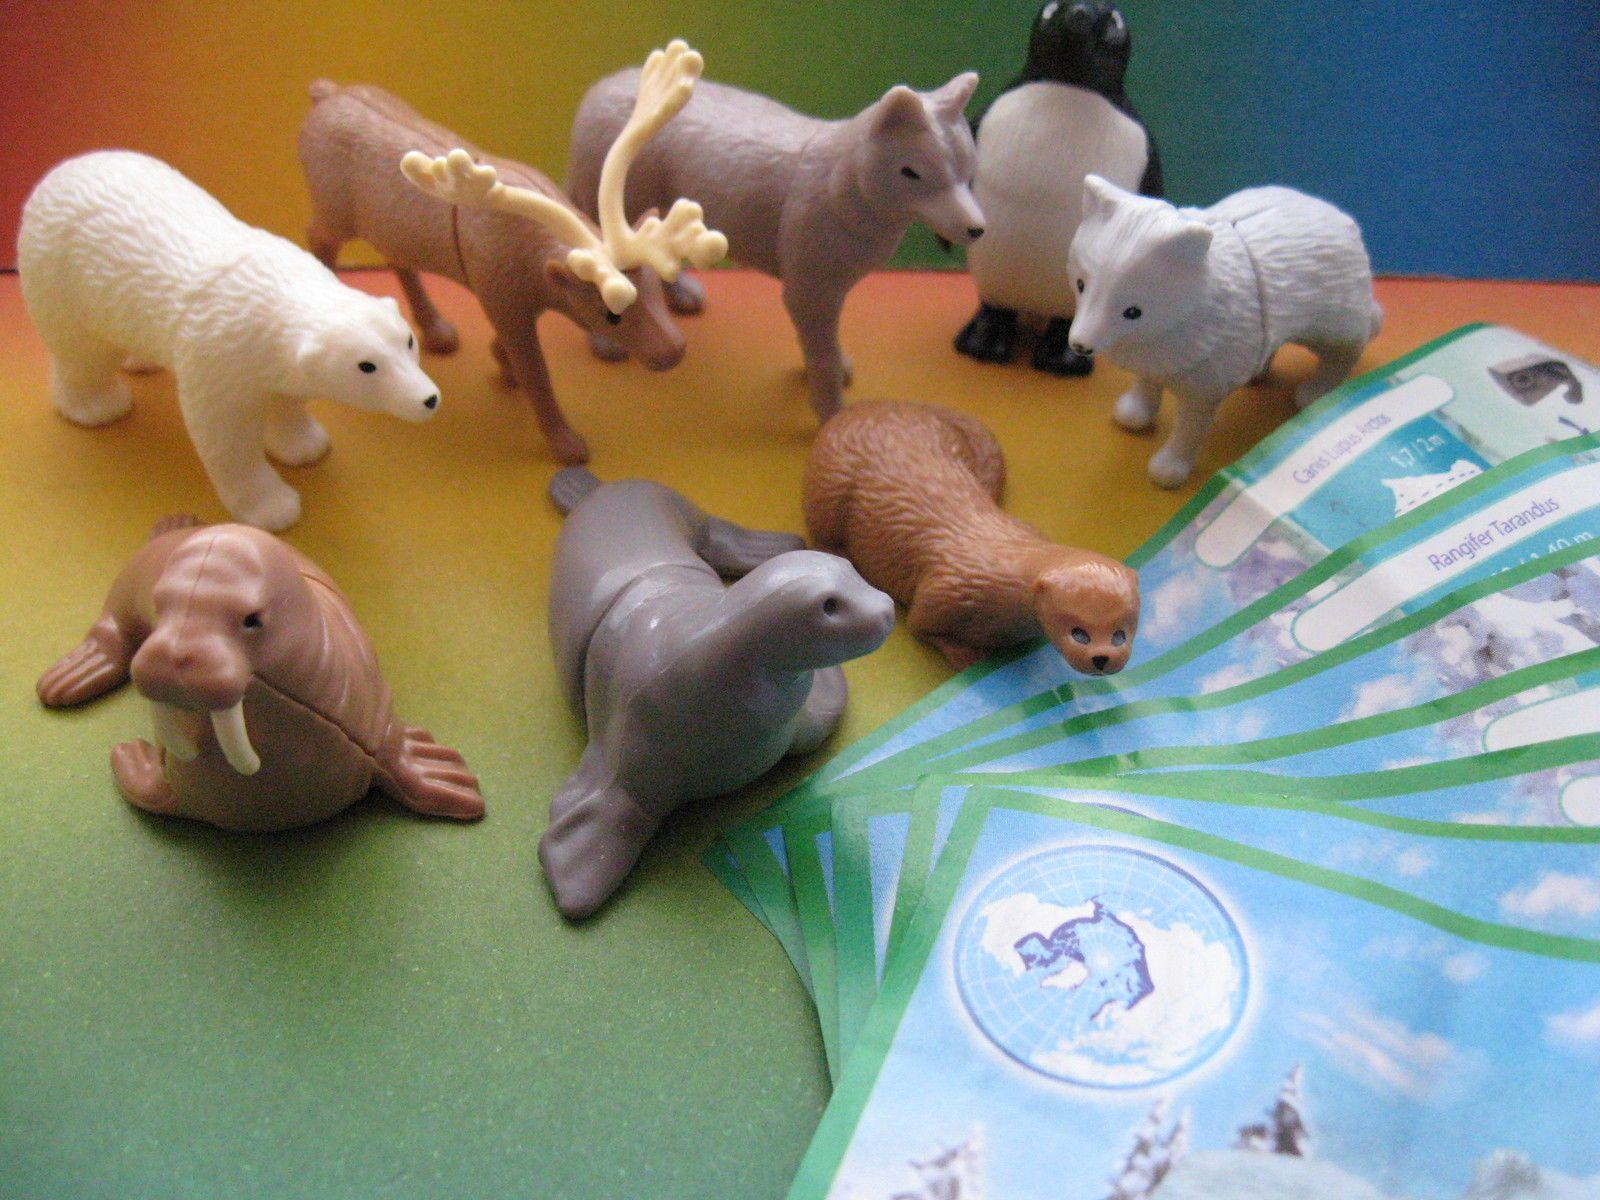 Details about TRArctic Polar AnimalsSeriesIndividual